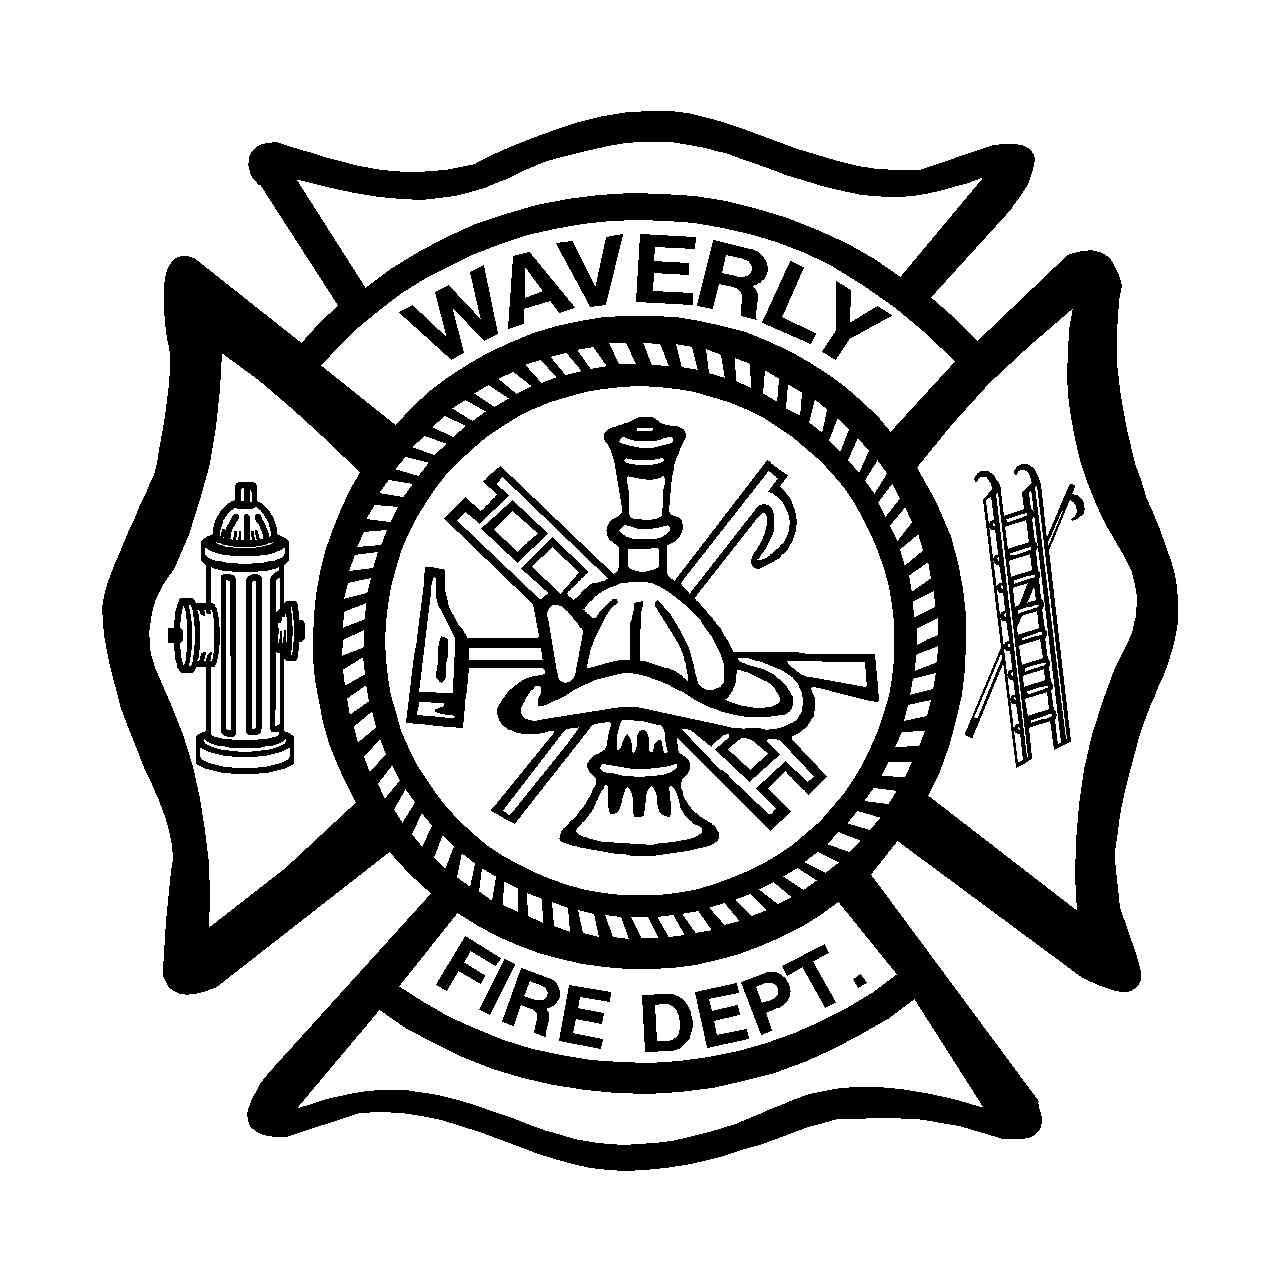 Firefighter emblem clipart jpg royalty free stock Free Fire Dept Logo, Download Free Clip Art, Free Clip Art on ... jpg royalty free stock